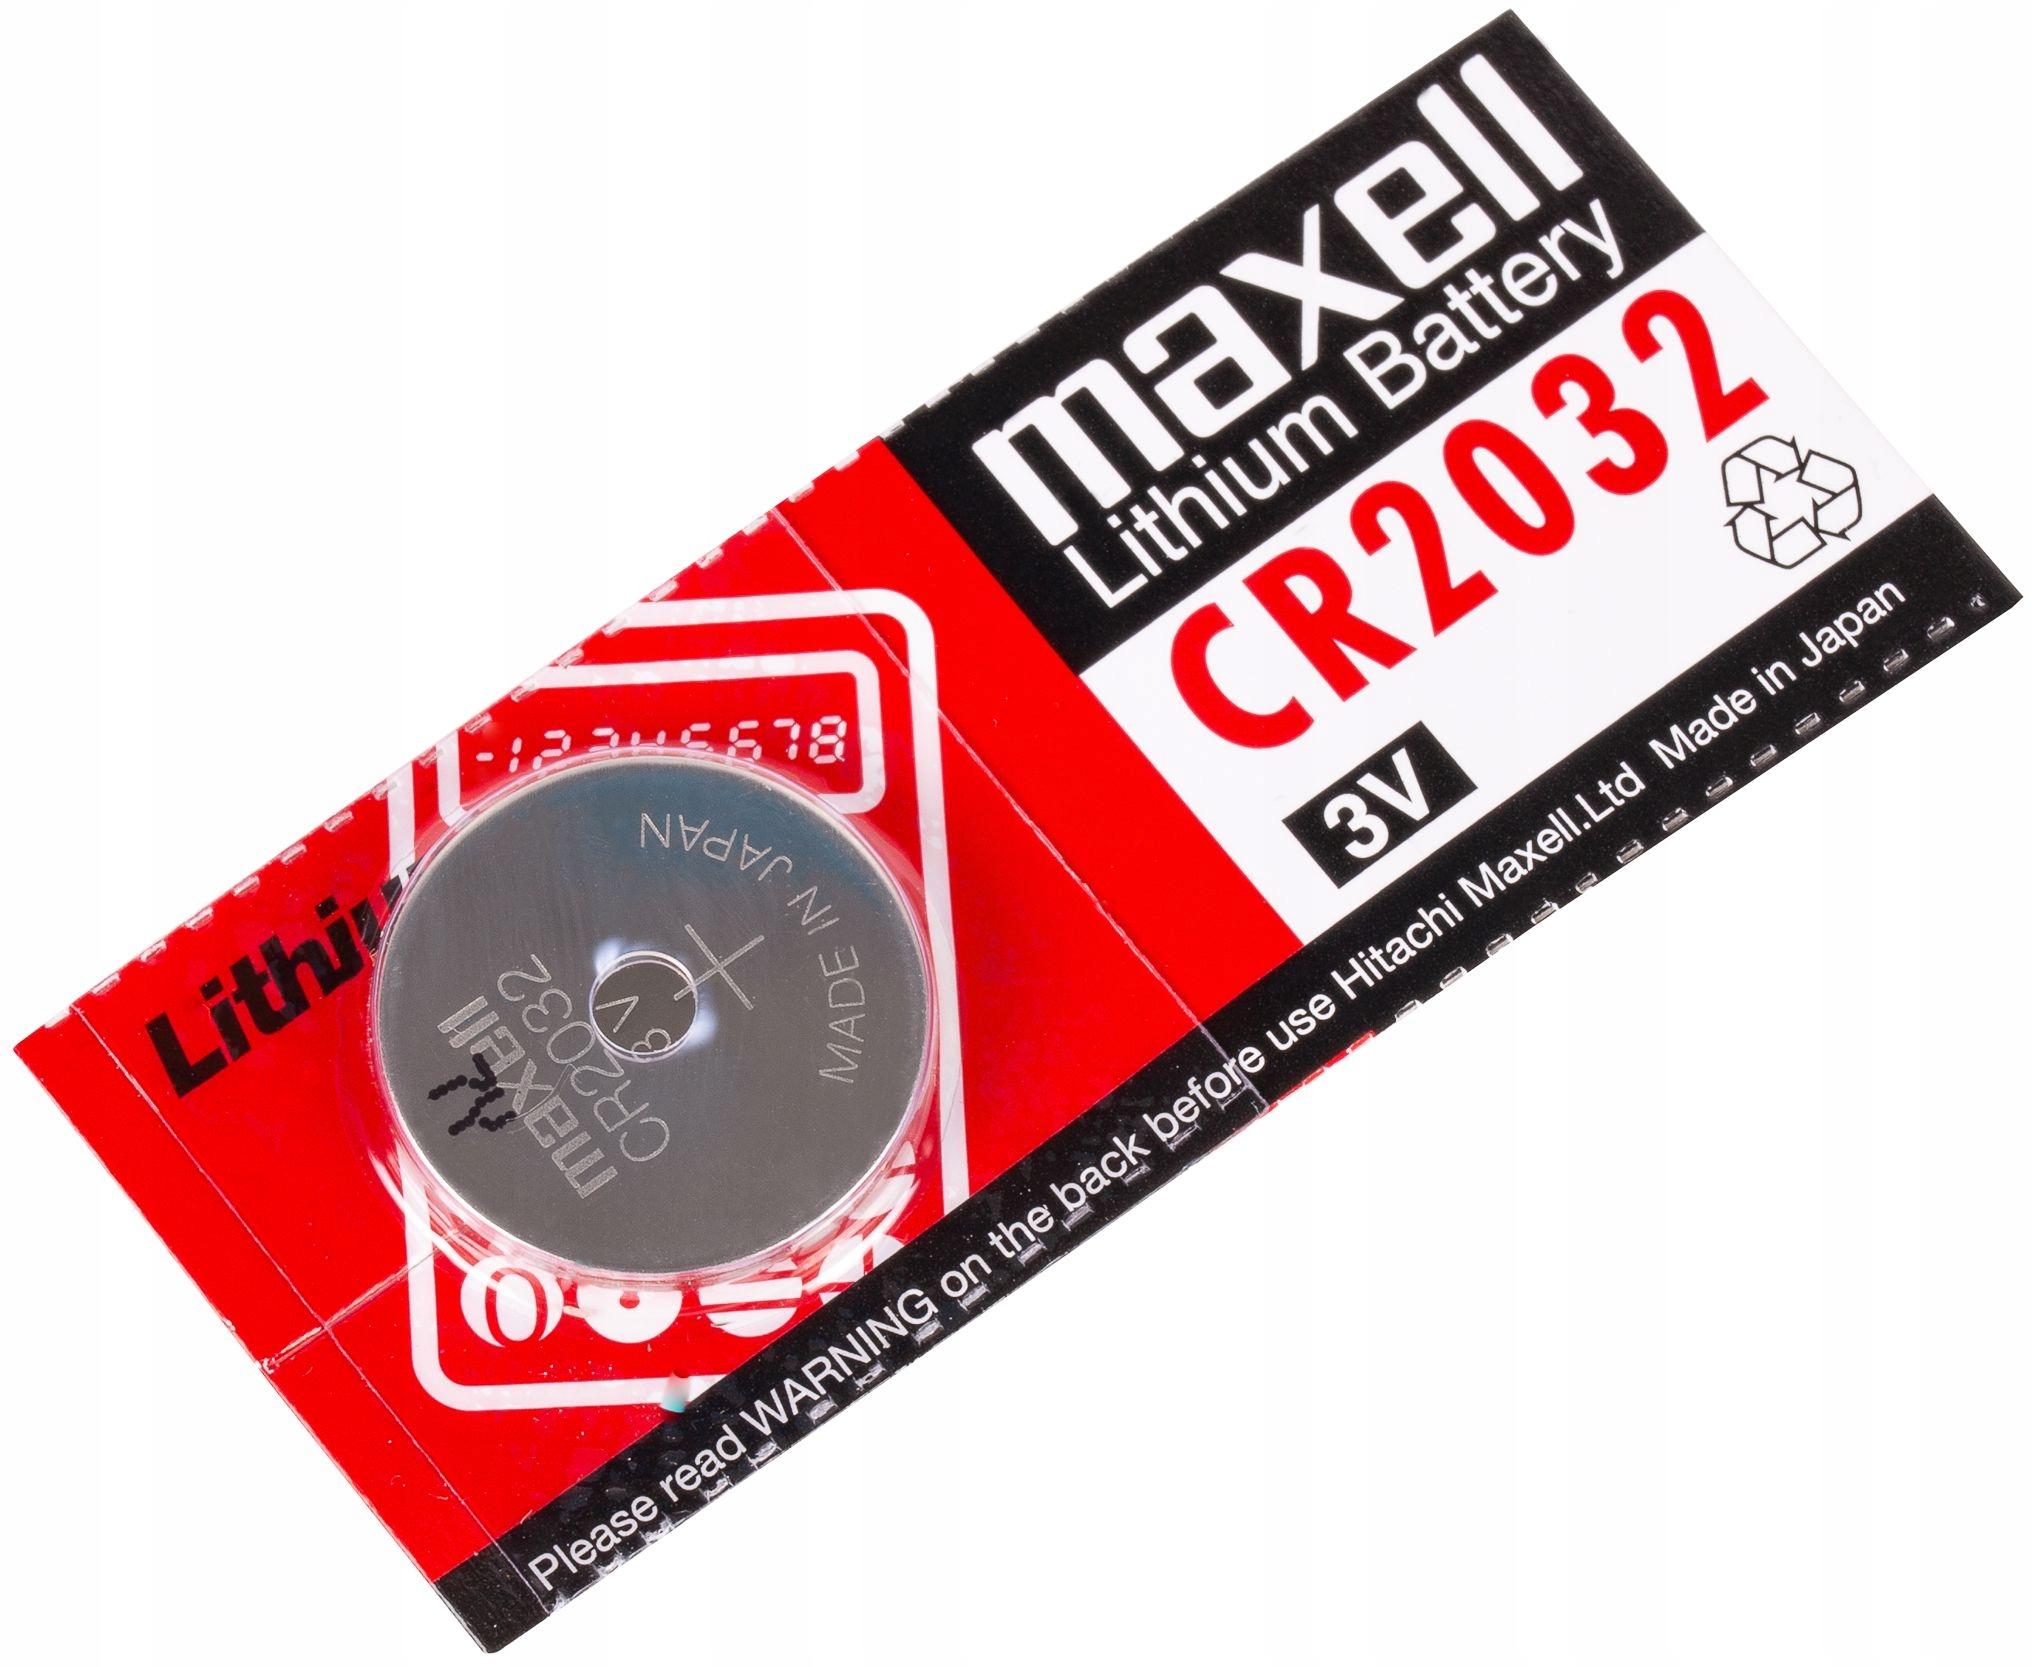 аккумулятор литиевая cr 2032 maxell cr2032 3v возможность